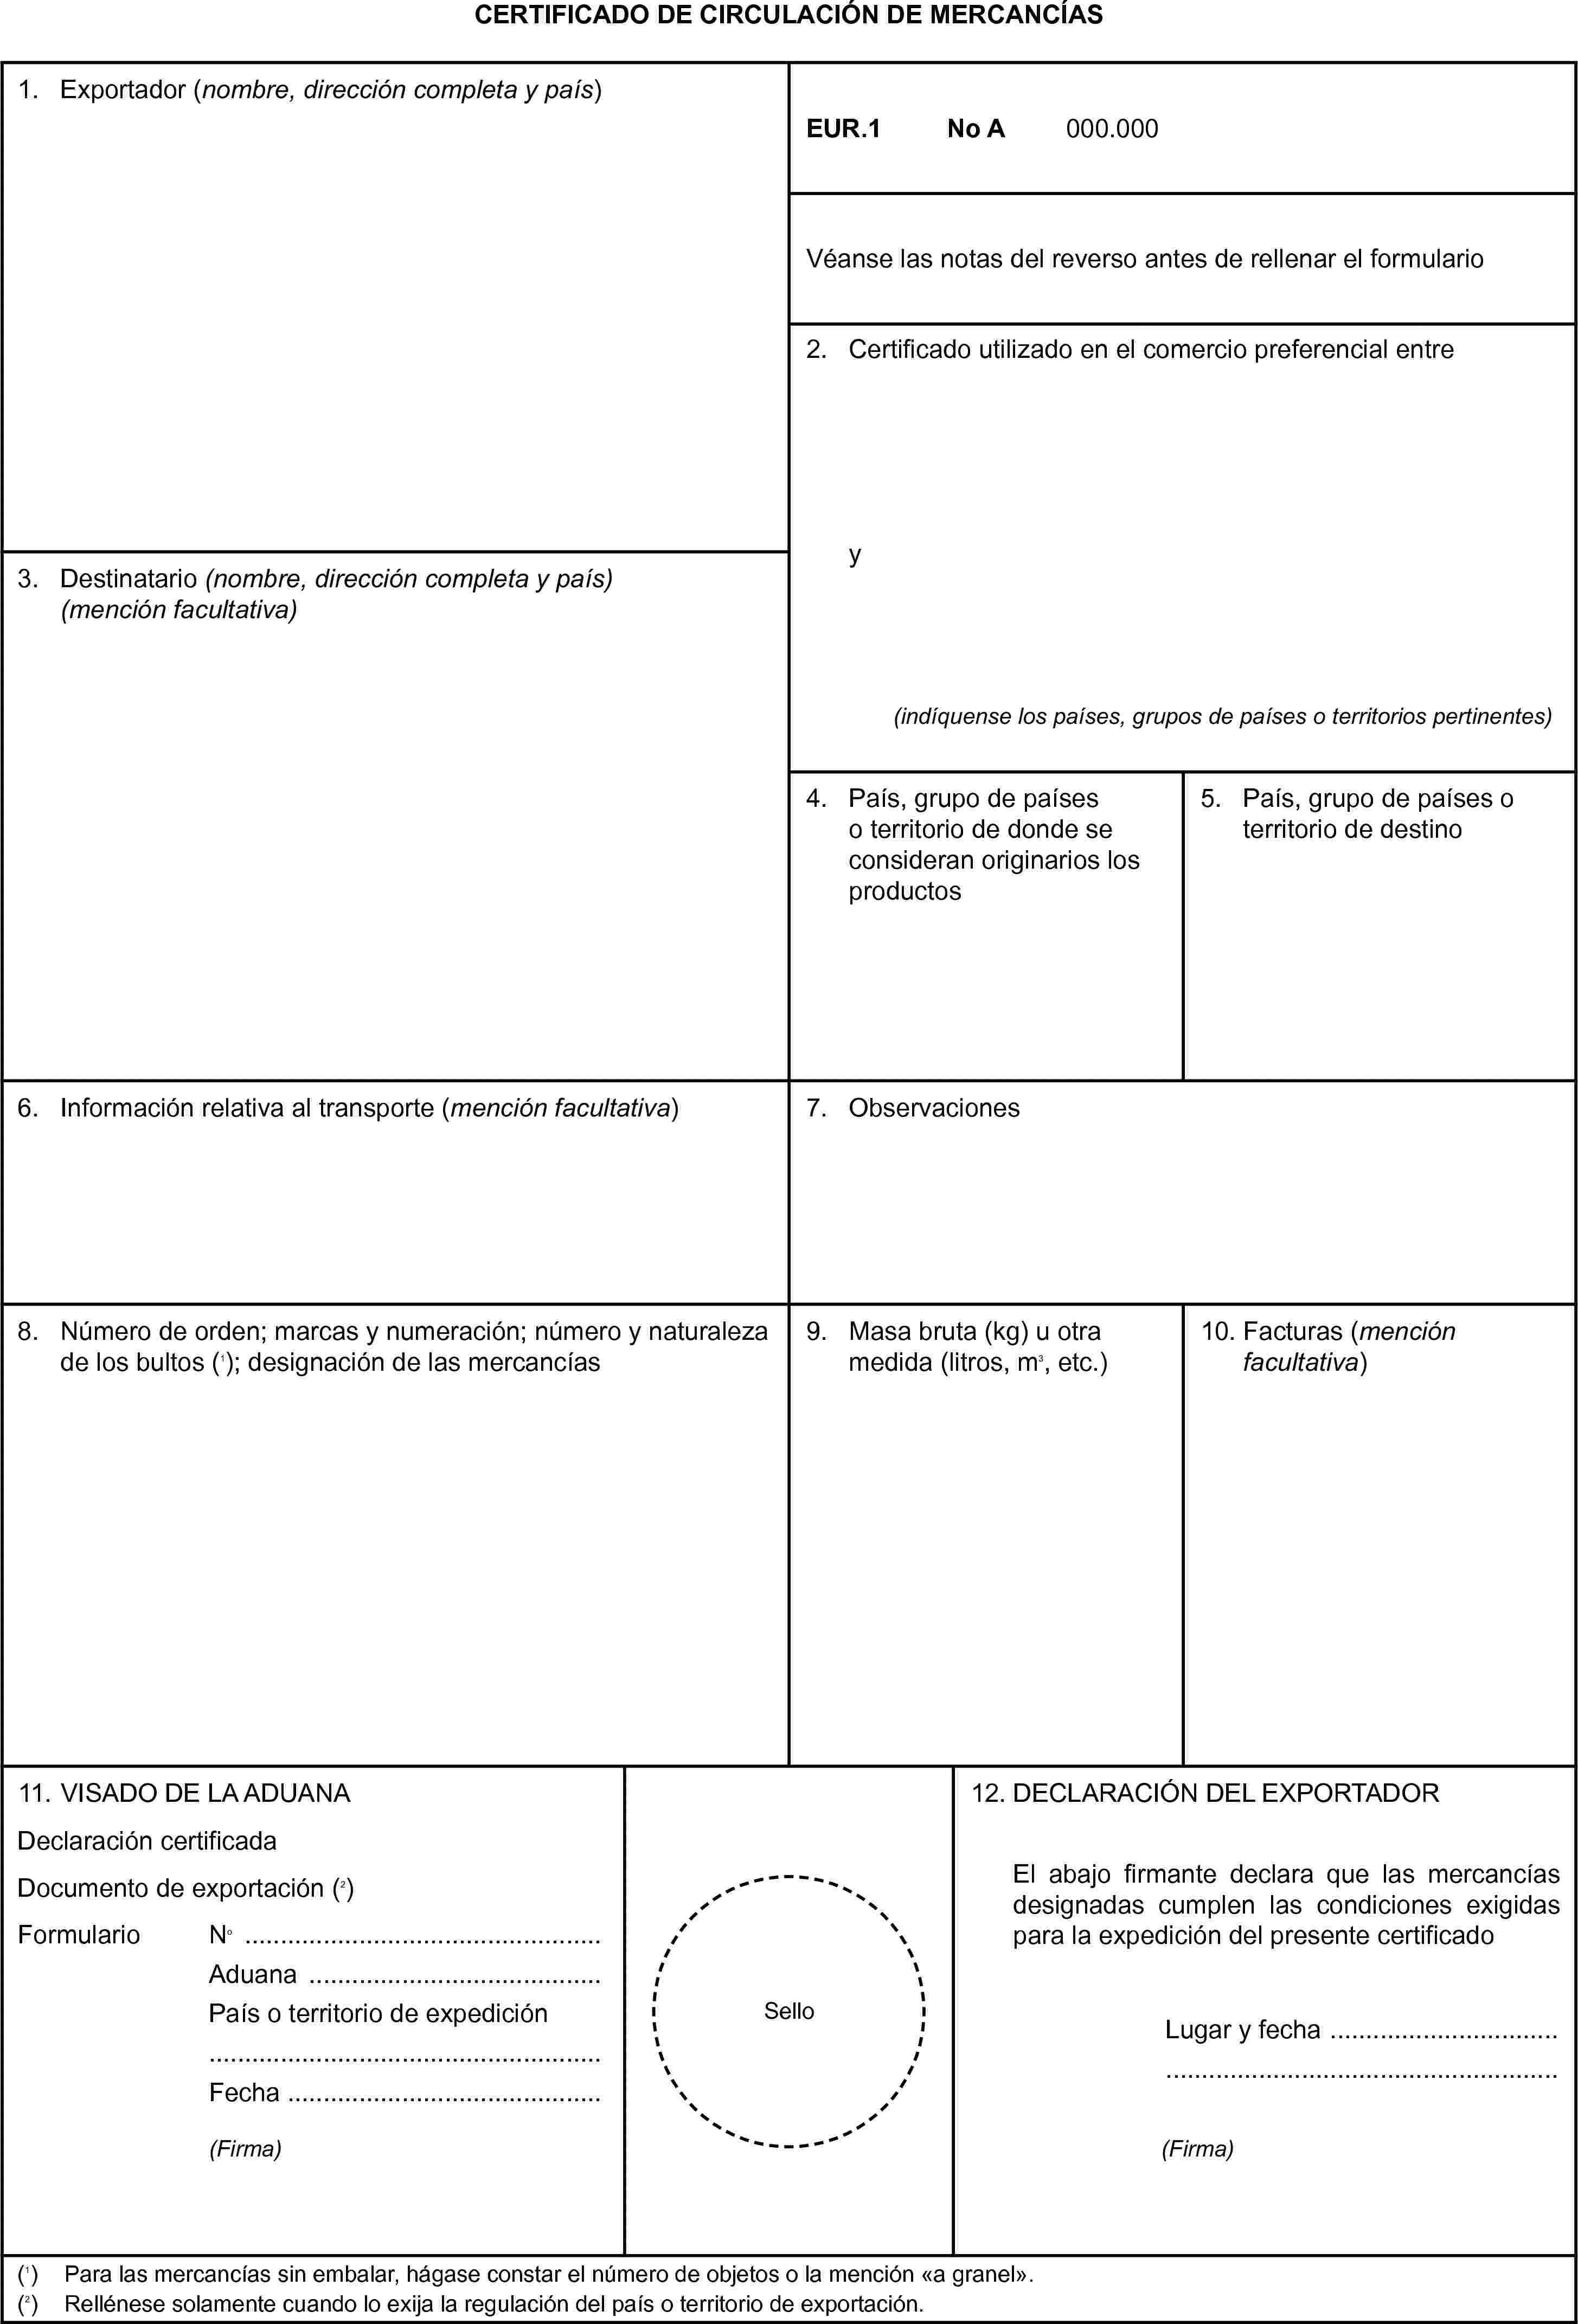 EUR-Lex - 02007R1528-20141001 - EN - EUR-Lex